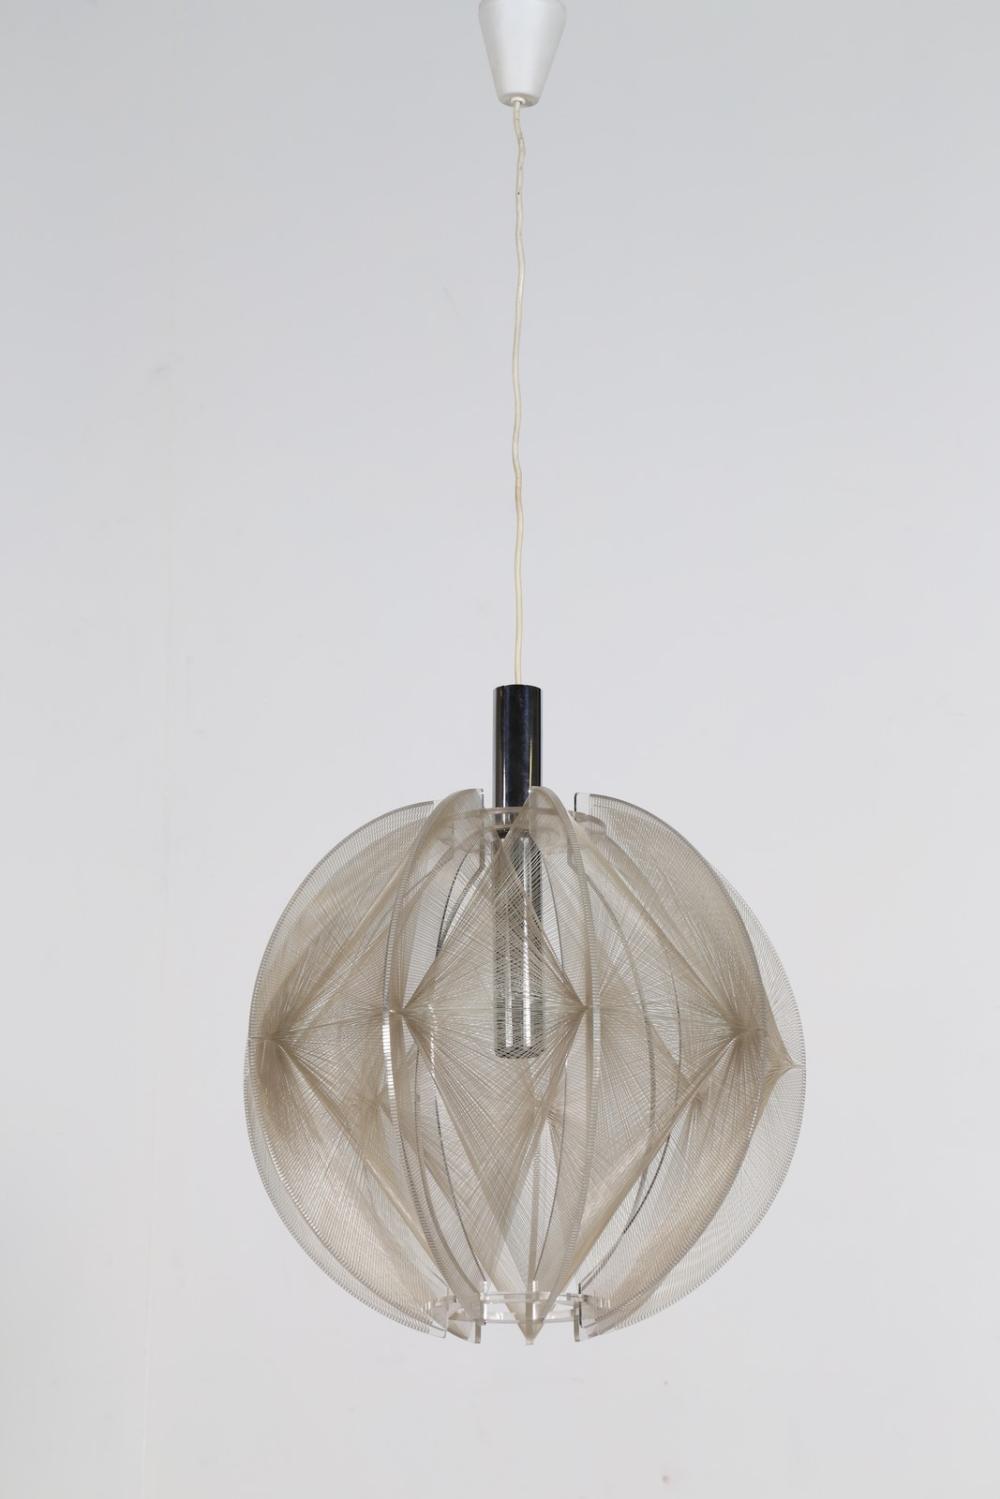 SECON PAUL (1916 - 2007) Ceiling lamp mod. Swag